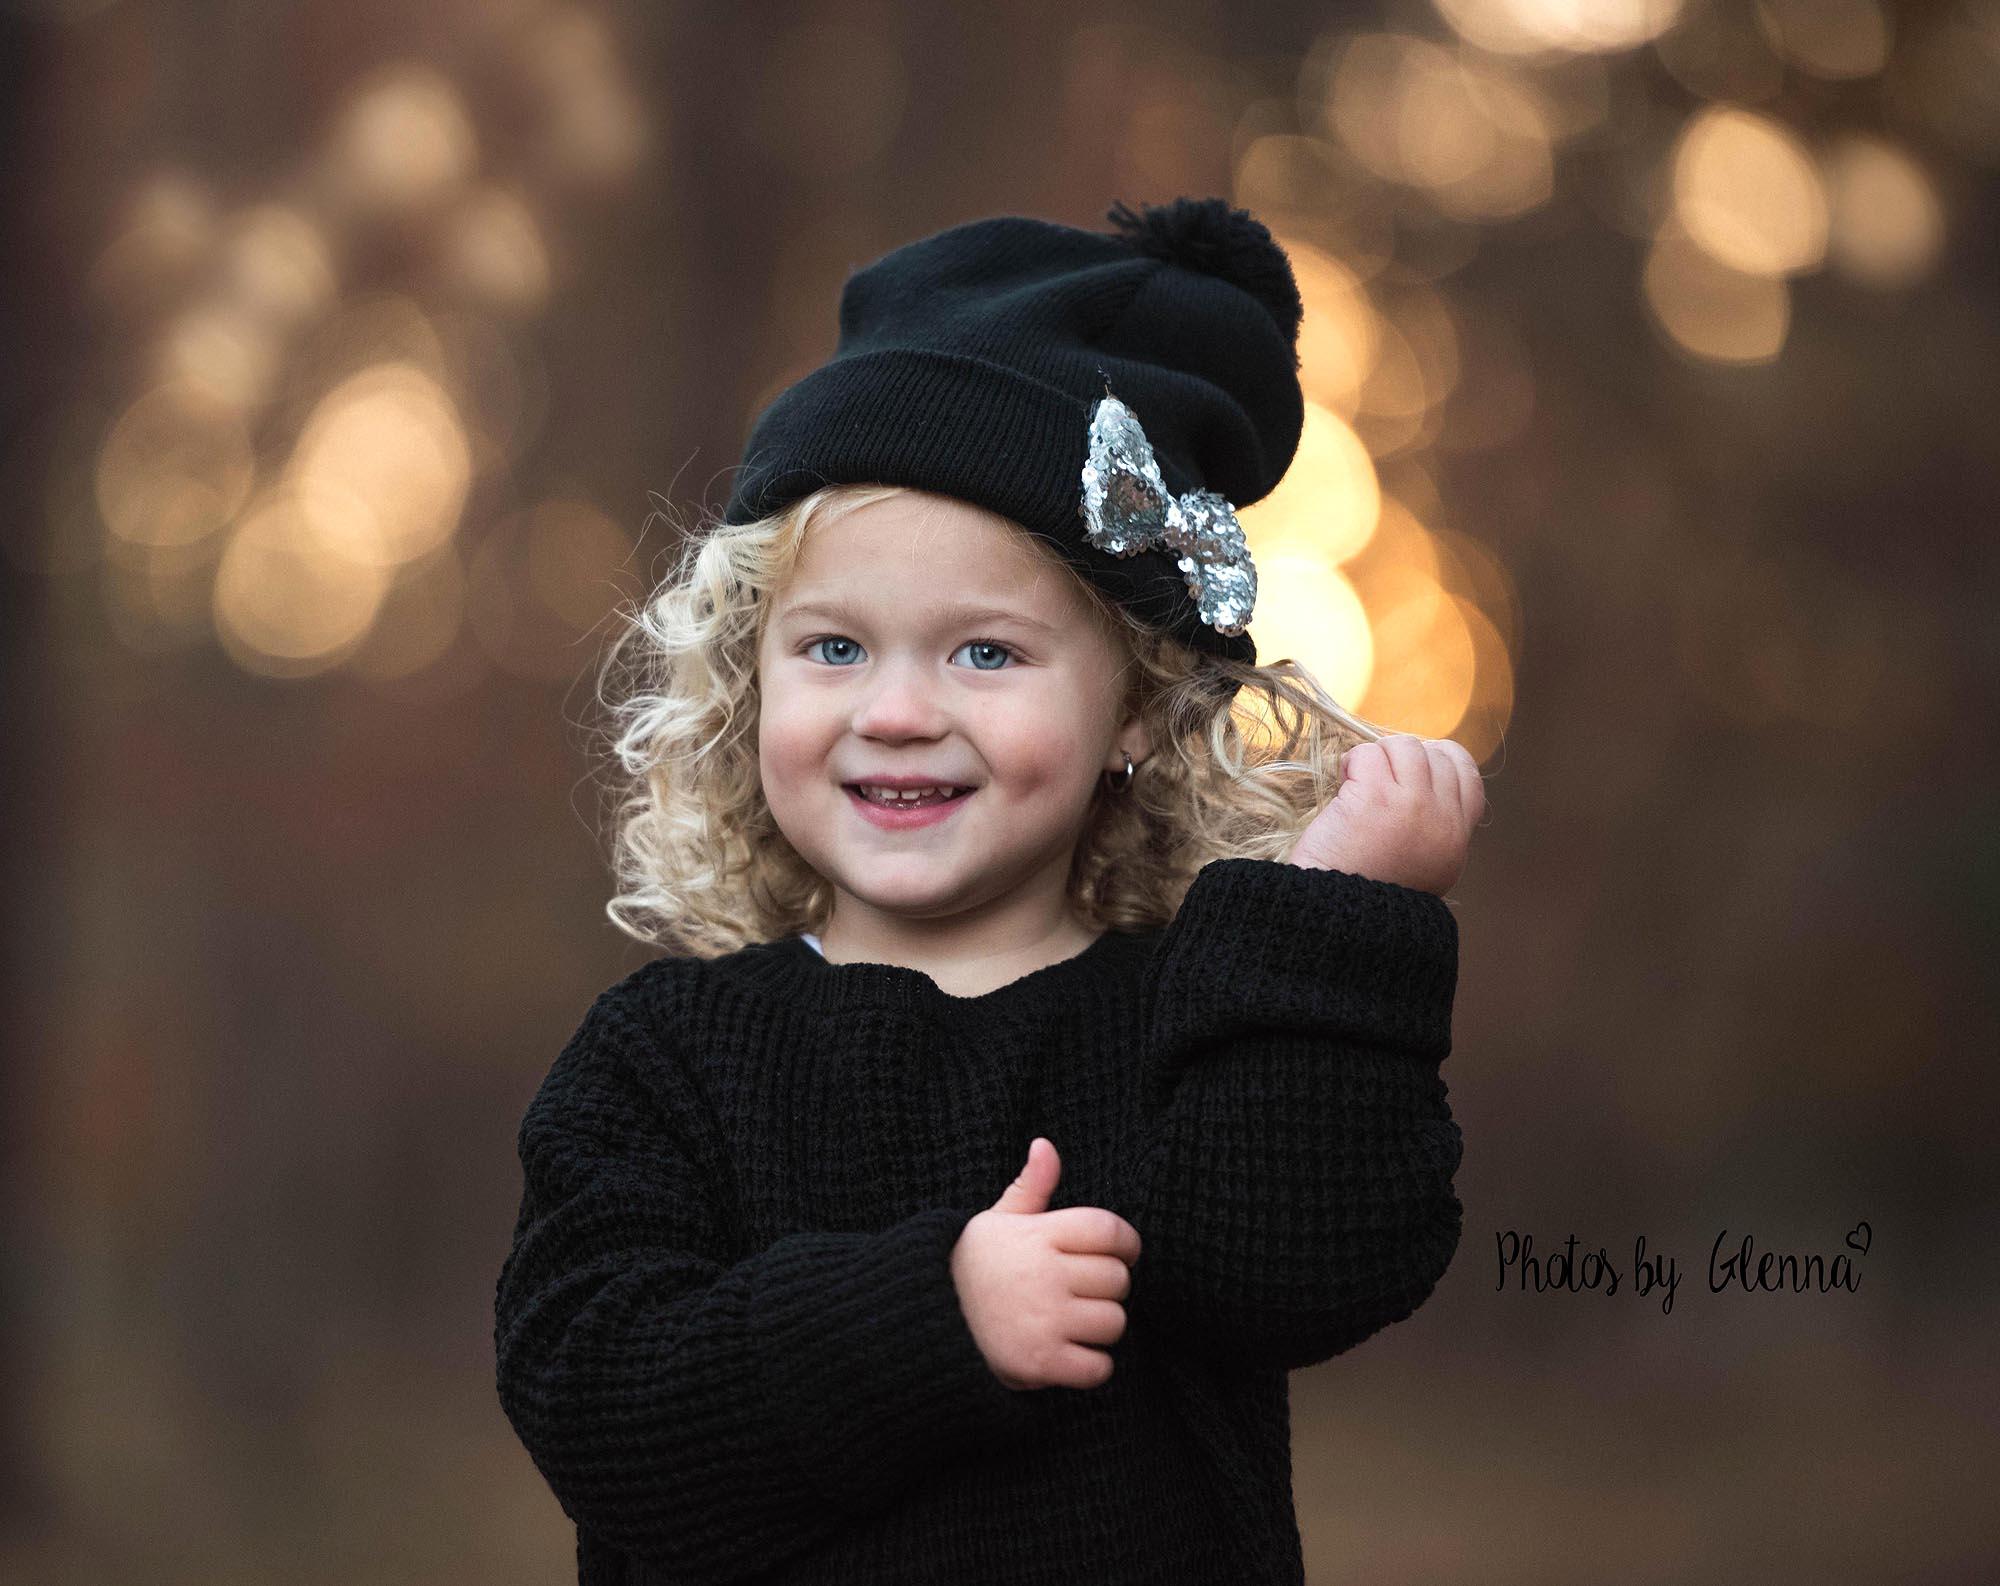 childrens photographer